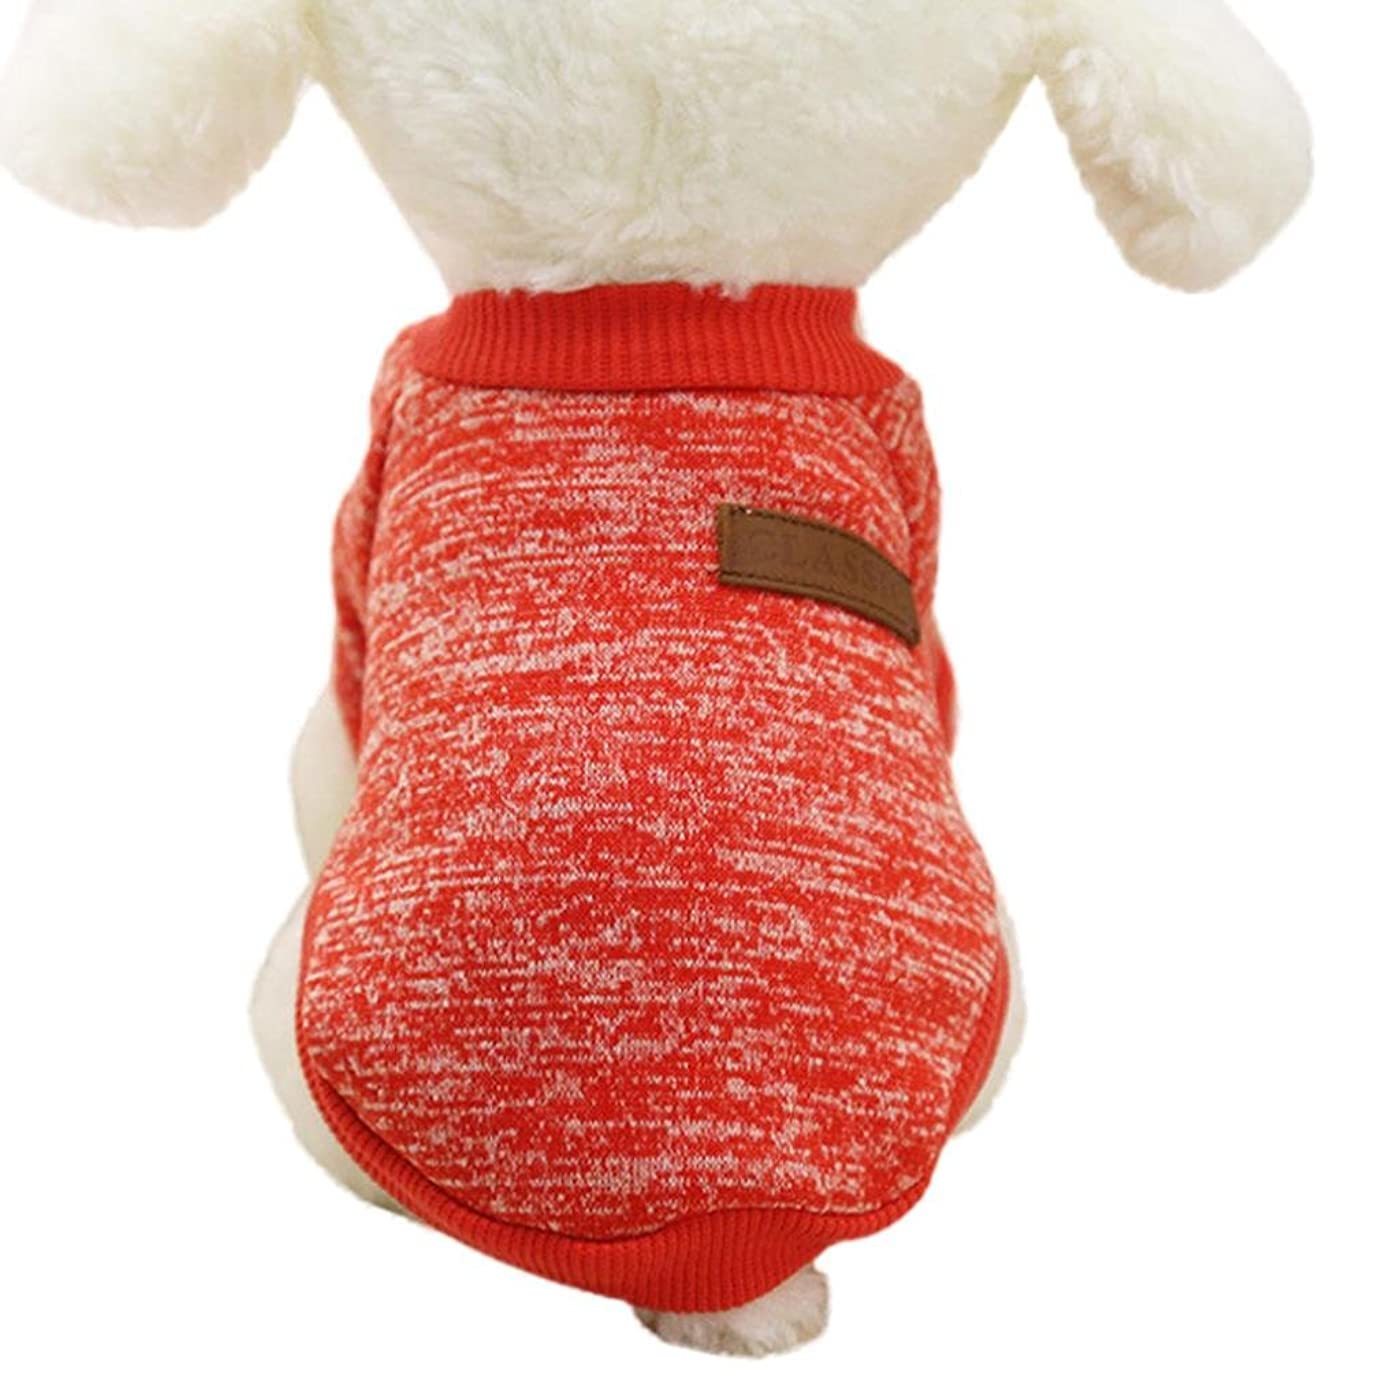 WensLTD Pet Dog Puppy Classic Sweater Fleece Sweater Clothes Warm Sweater Winter